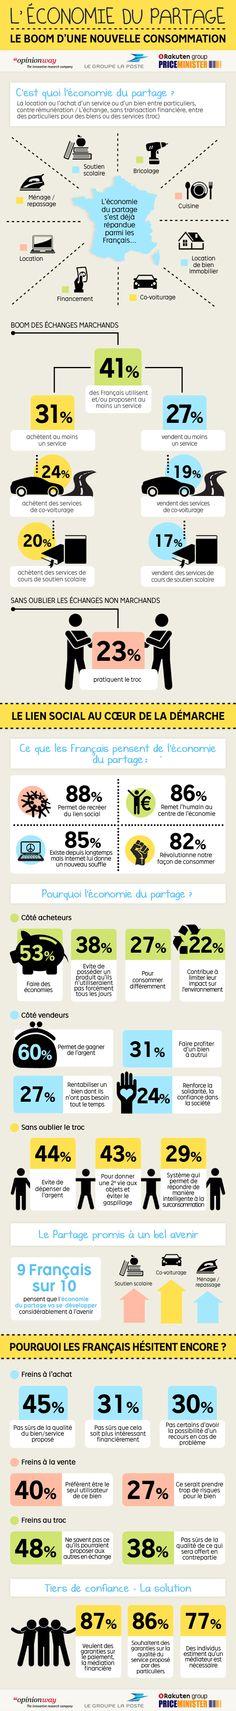 Infographie sur l'étude @PriceMinister - Rakuten - Rakuten - Rakuten / @groupelaposte sur l'économie du partage #collcons #share